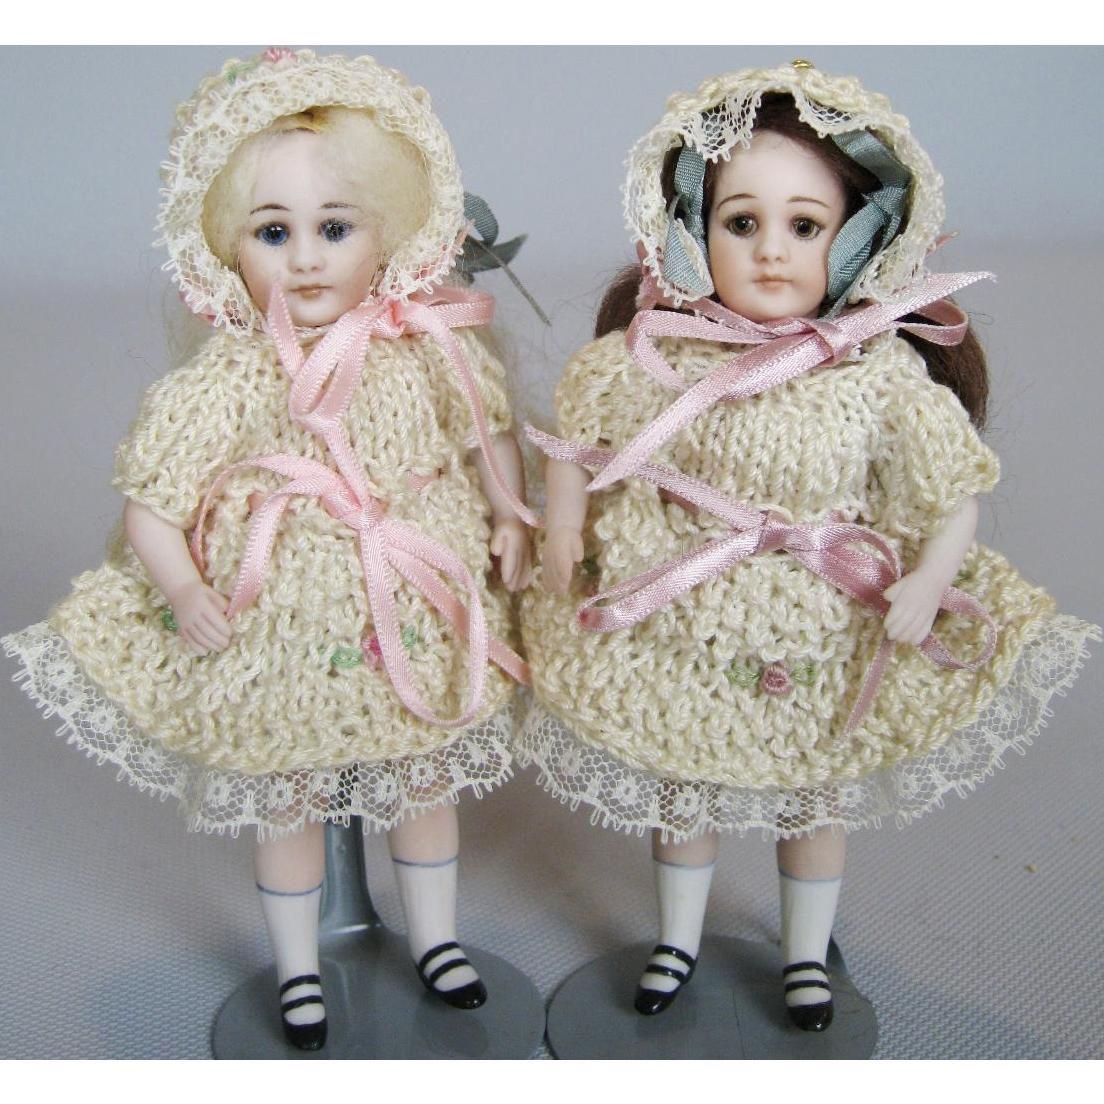 "5"" All Bisque Artist Mignonette Dolls ~ So Adorable with Crochet Dresses!"